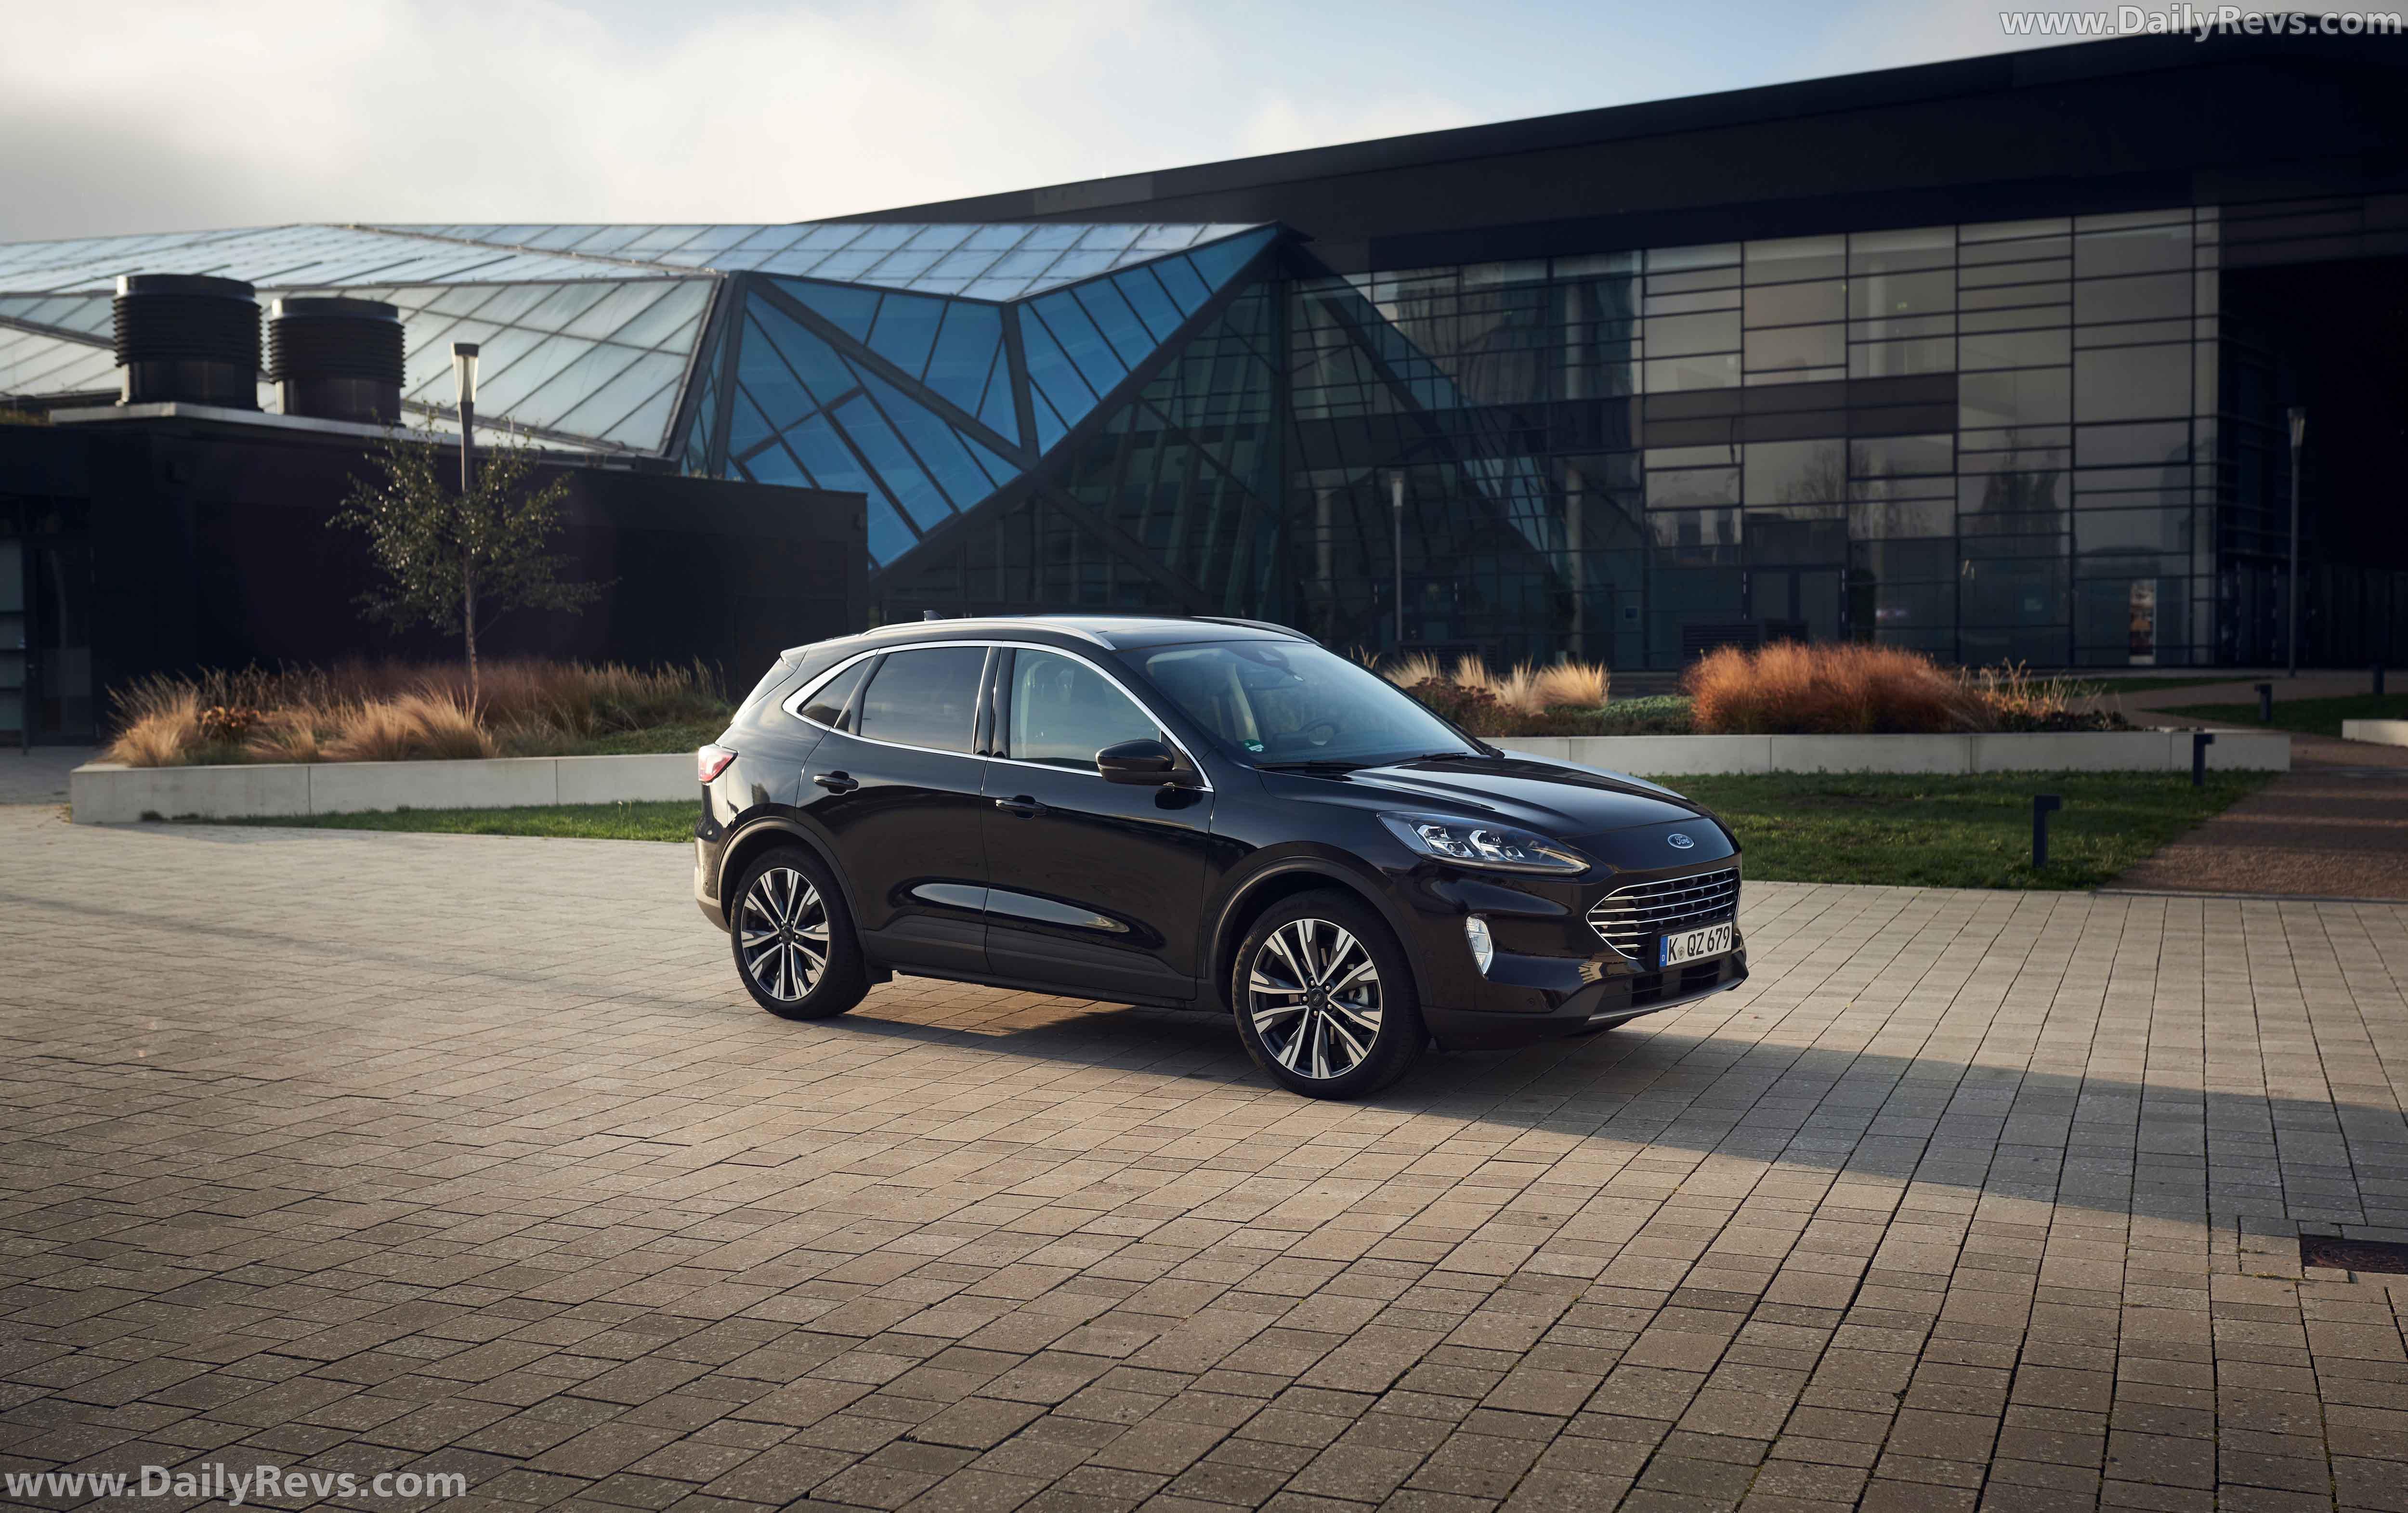 2021 Ford Kuga Hybrid - Dailyrevs